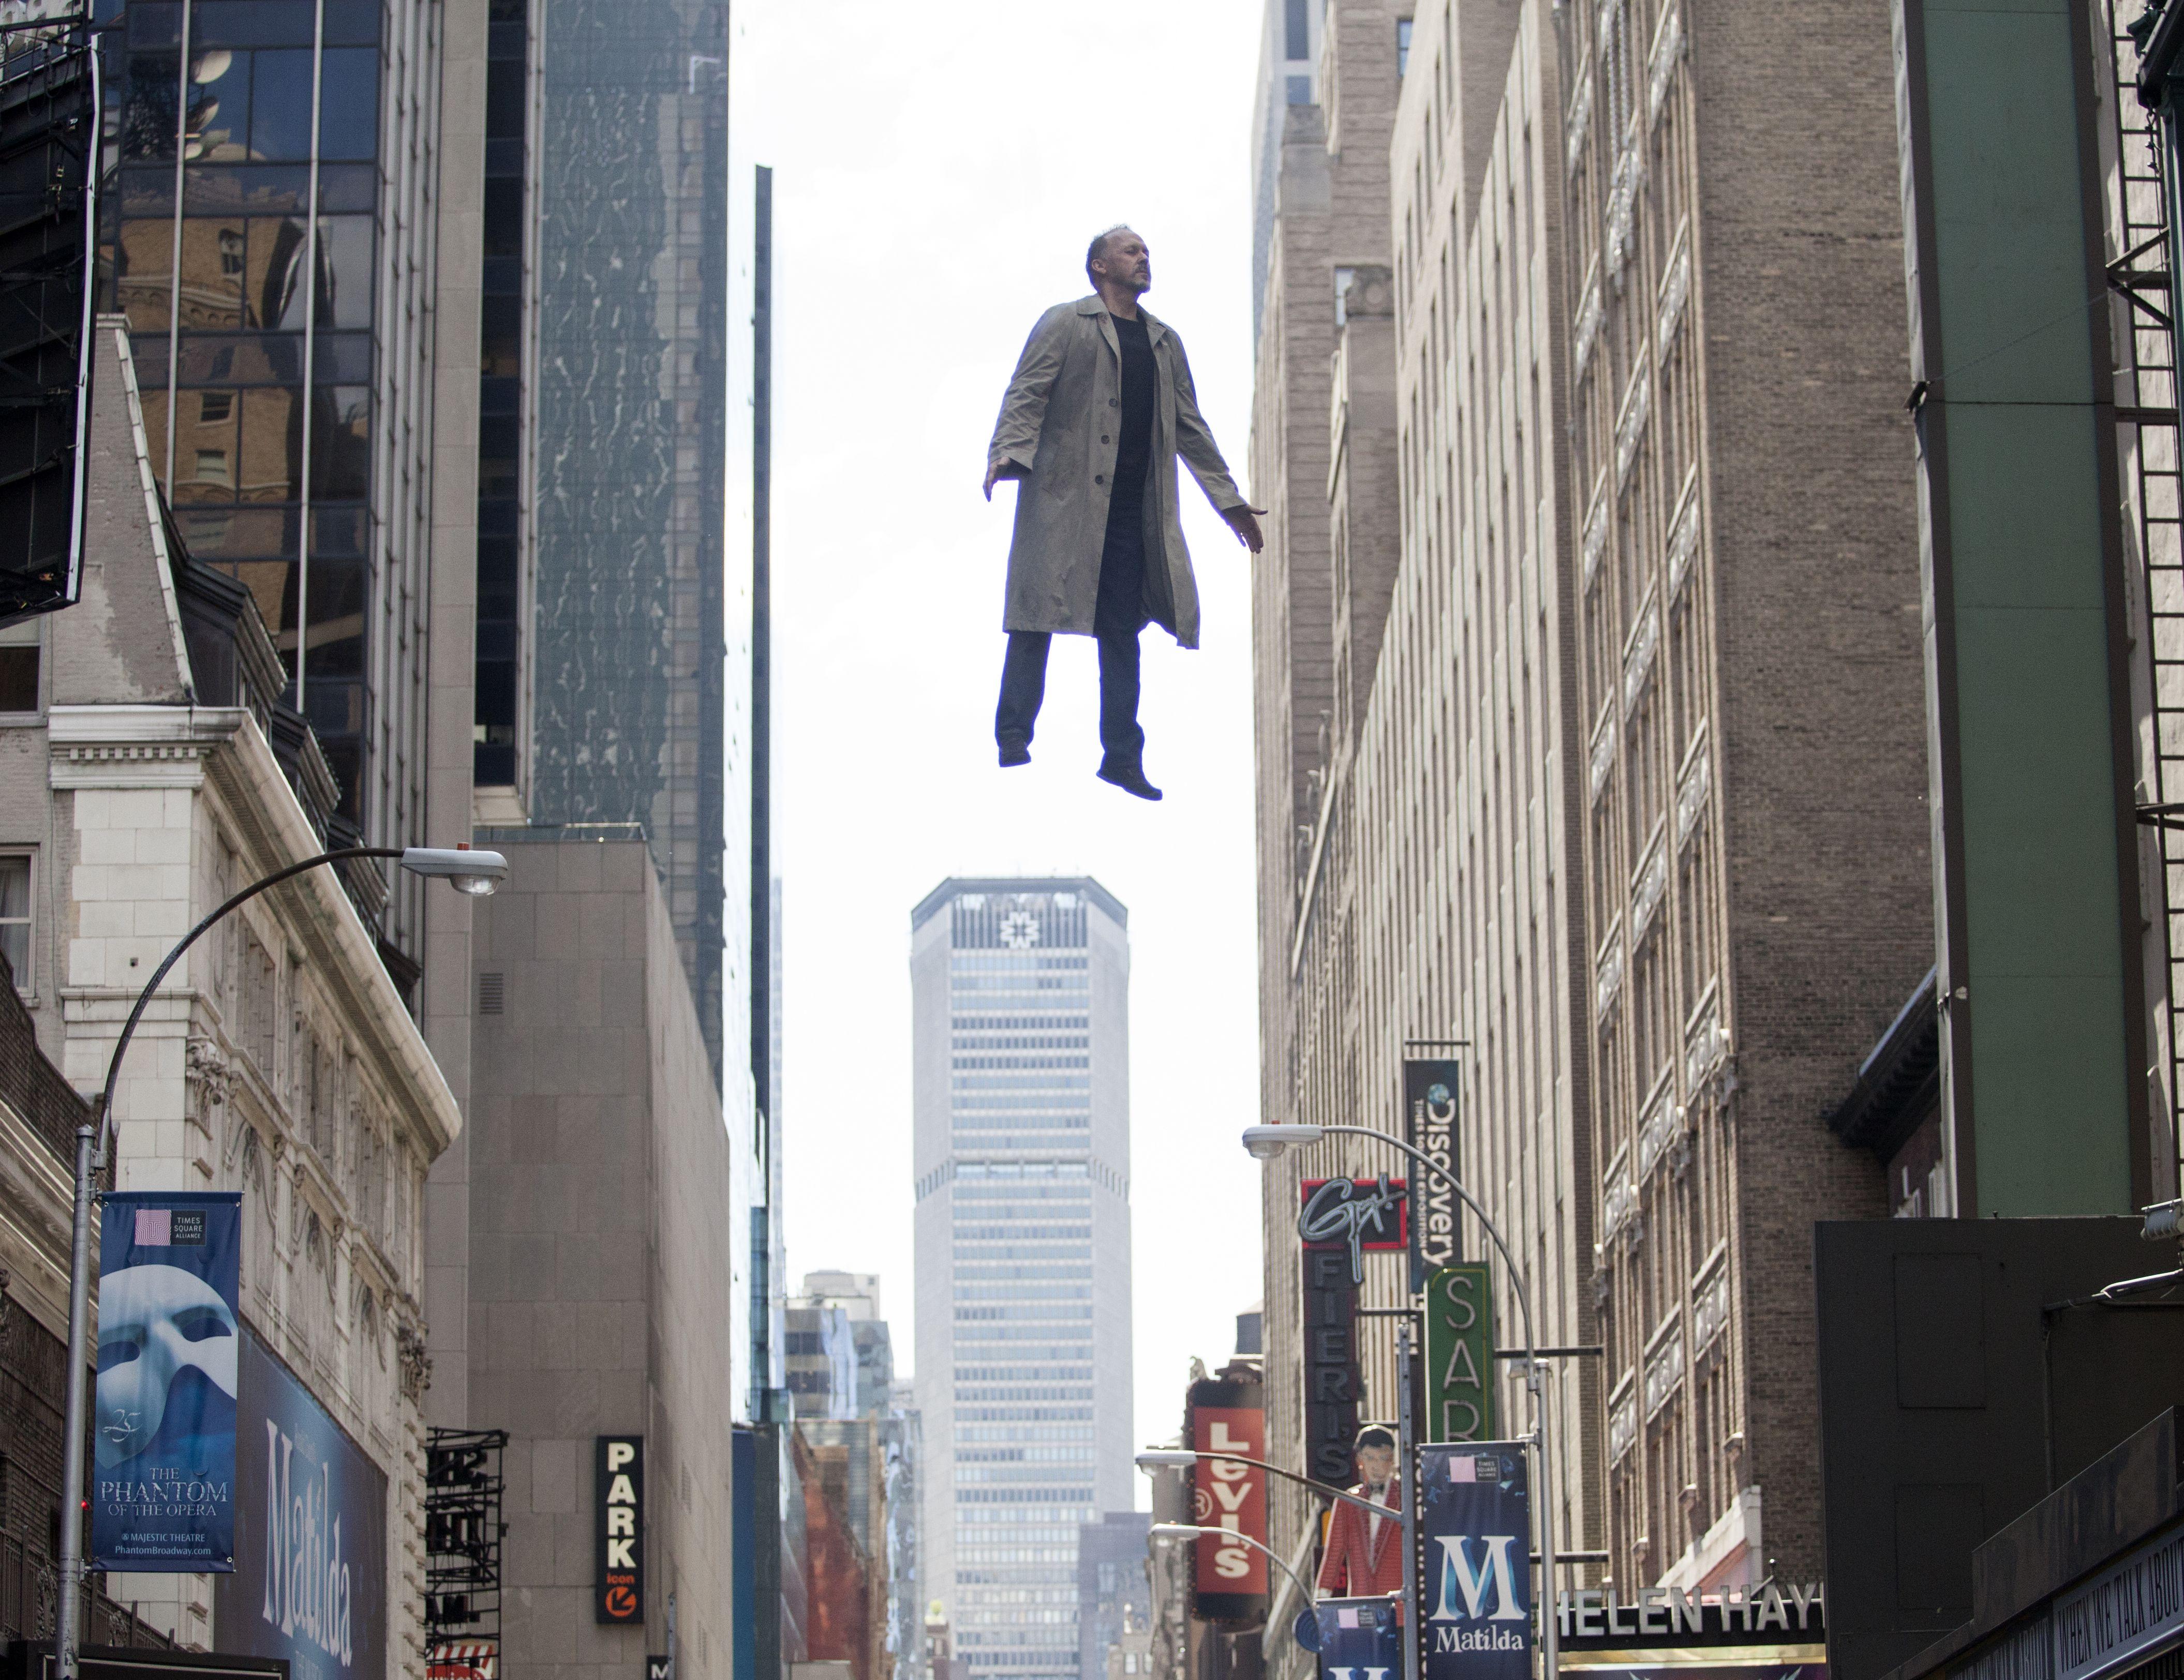 Michael Keaton flies in Birdman